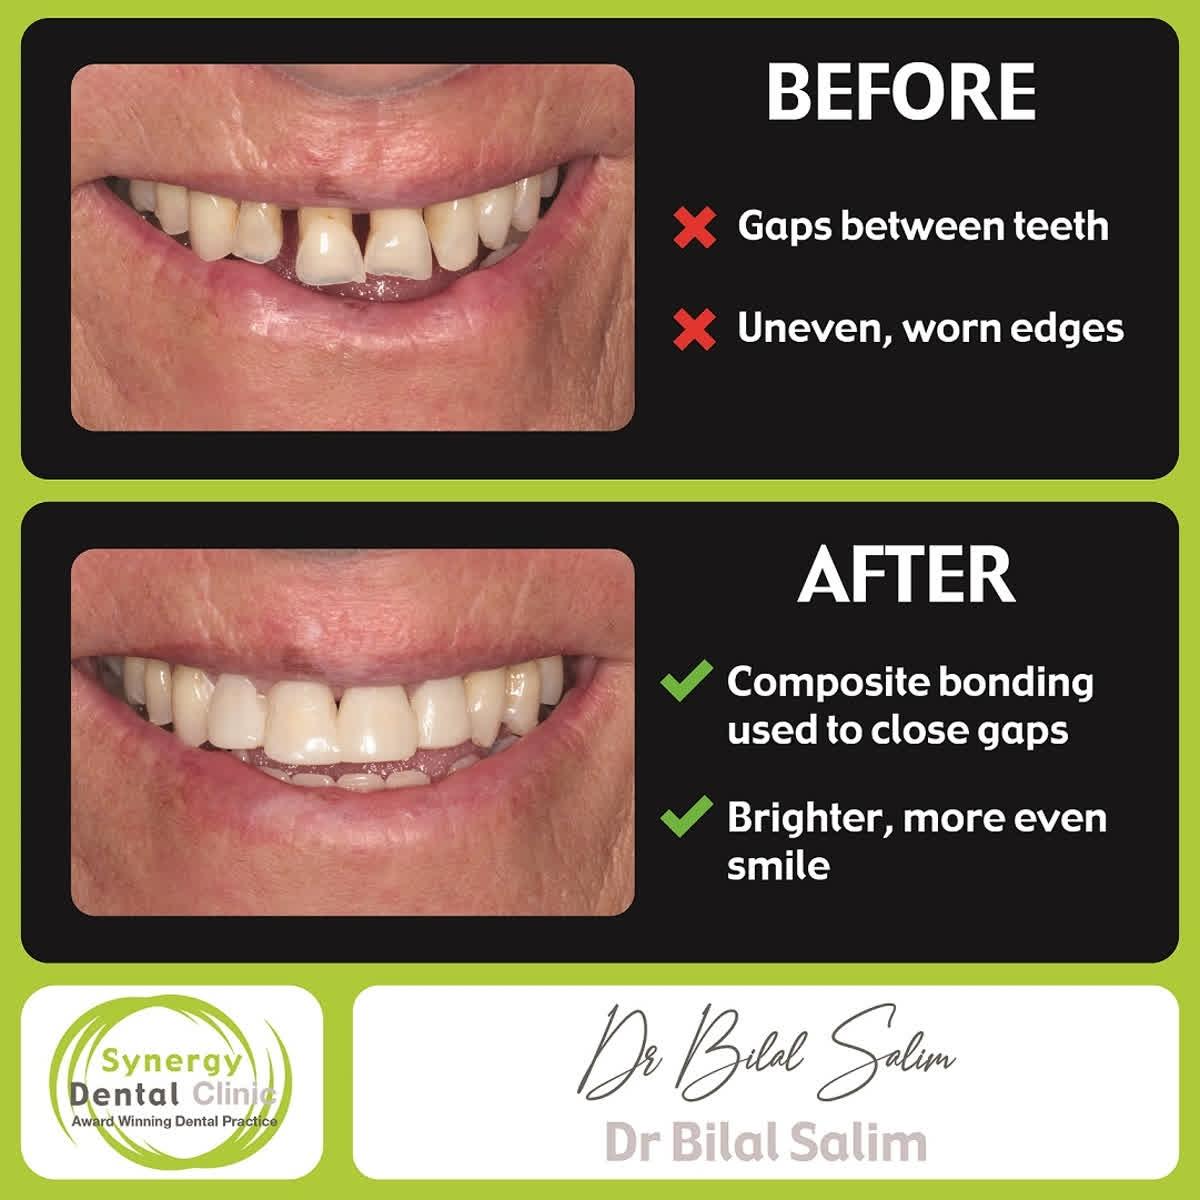 http://www.synergydental.org.uk   Instagram - http://www.instagram.com/synergydentalclinic/…  Twitter - SynergyDentist   Youtube - Synergy Dental Clinics . . . . #toothwhitening #teethwhitening #smilemakeover #dentist #transformation #dentalphotography #cosmetics #makeupartist #fffpic.twitter.com/WtBKYm2Svj